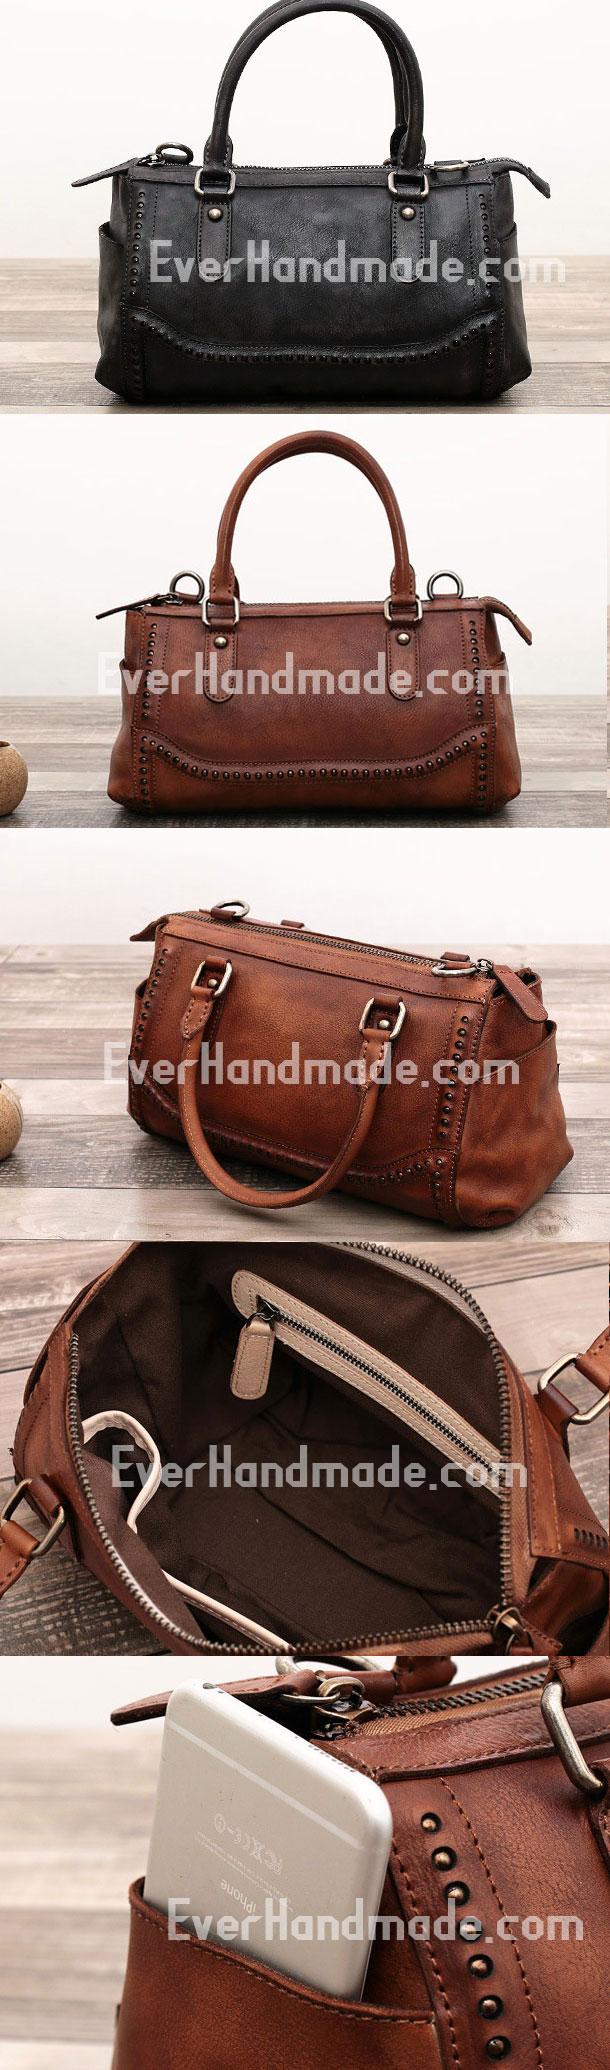 https://www.everhandmade.com/collections/frontpage/products/copy-of-genuine-handmade-boston-bag-vintage-leather-handbag-shoulder-bag-women-leather-purse